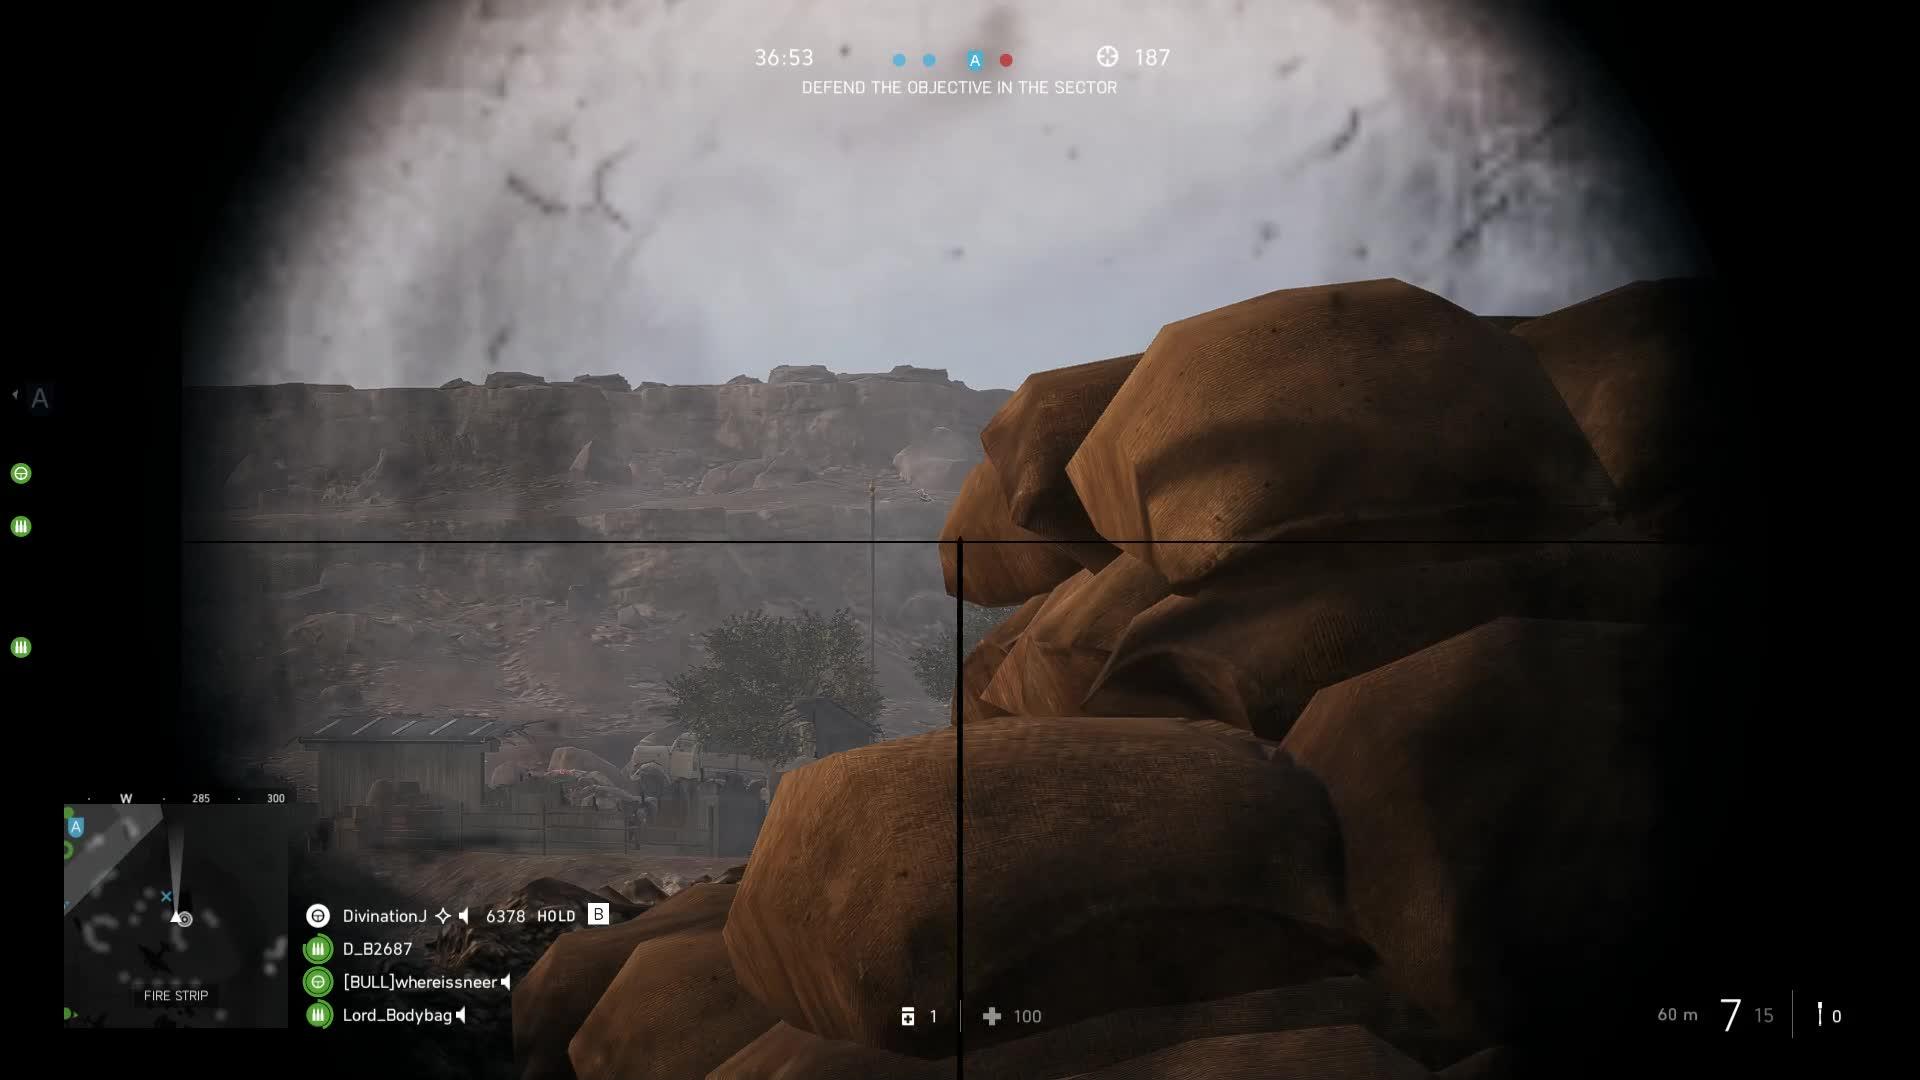 BF Lee Enfield, BF Sniper Headshot, BF5, BFV, BFV Sniper, Battlefield V, Battlefieldv, Lee Enfield at +150m is a dissapointment GIFs